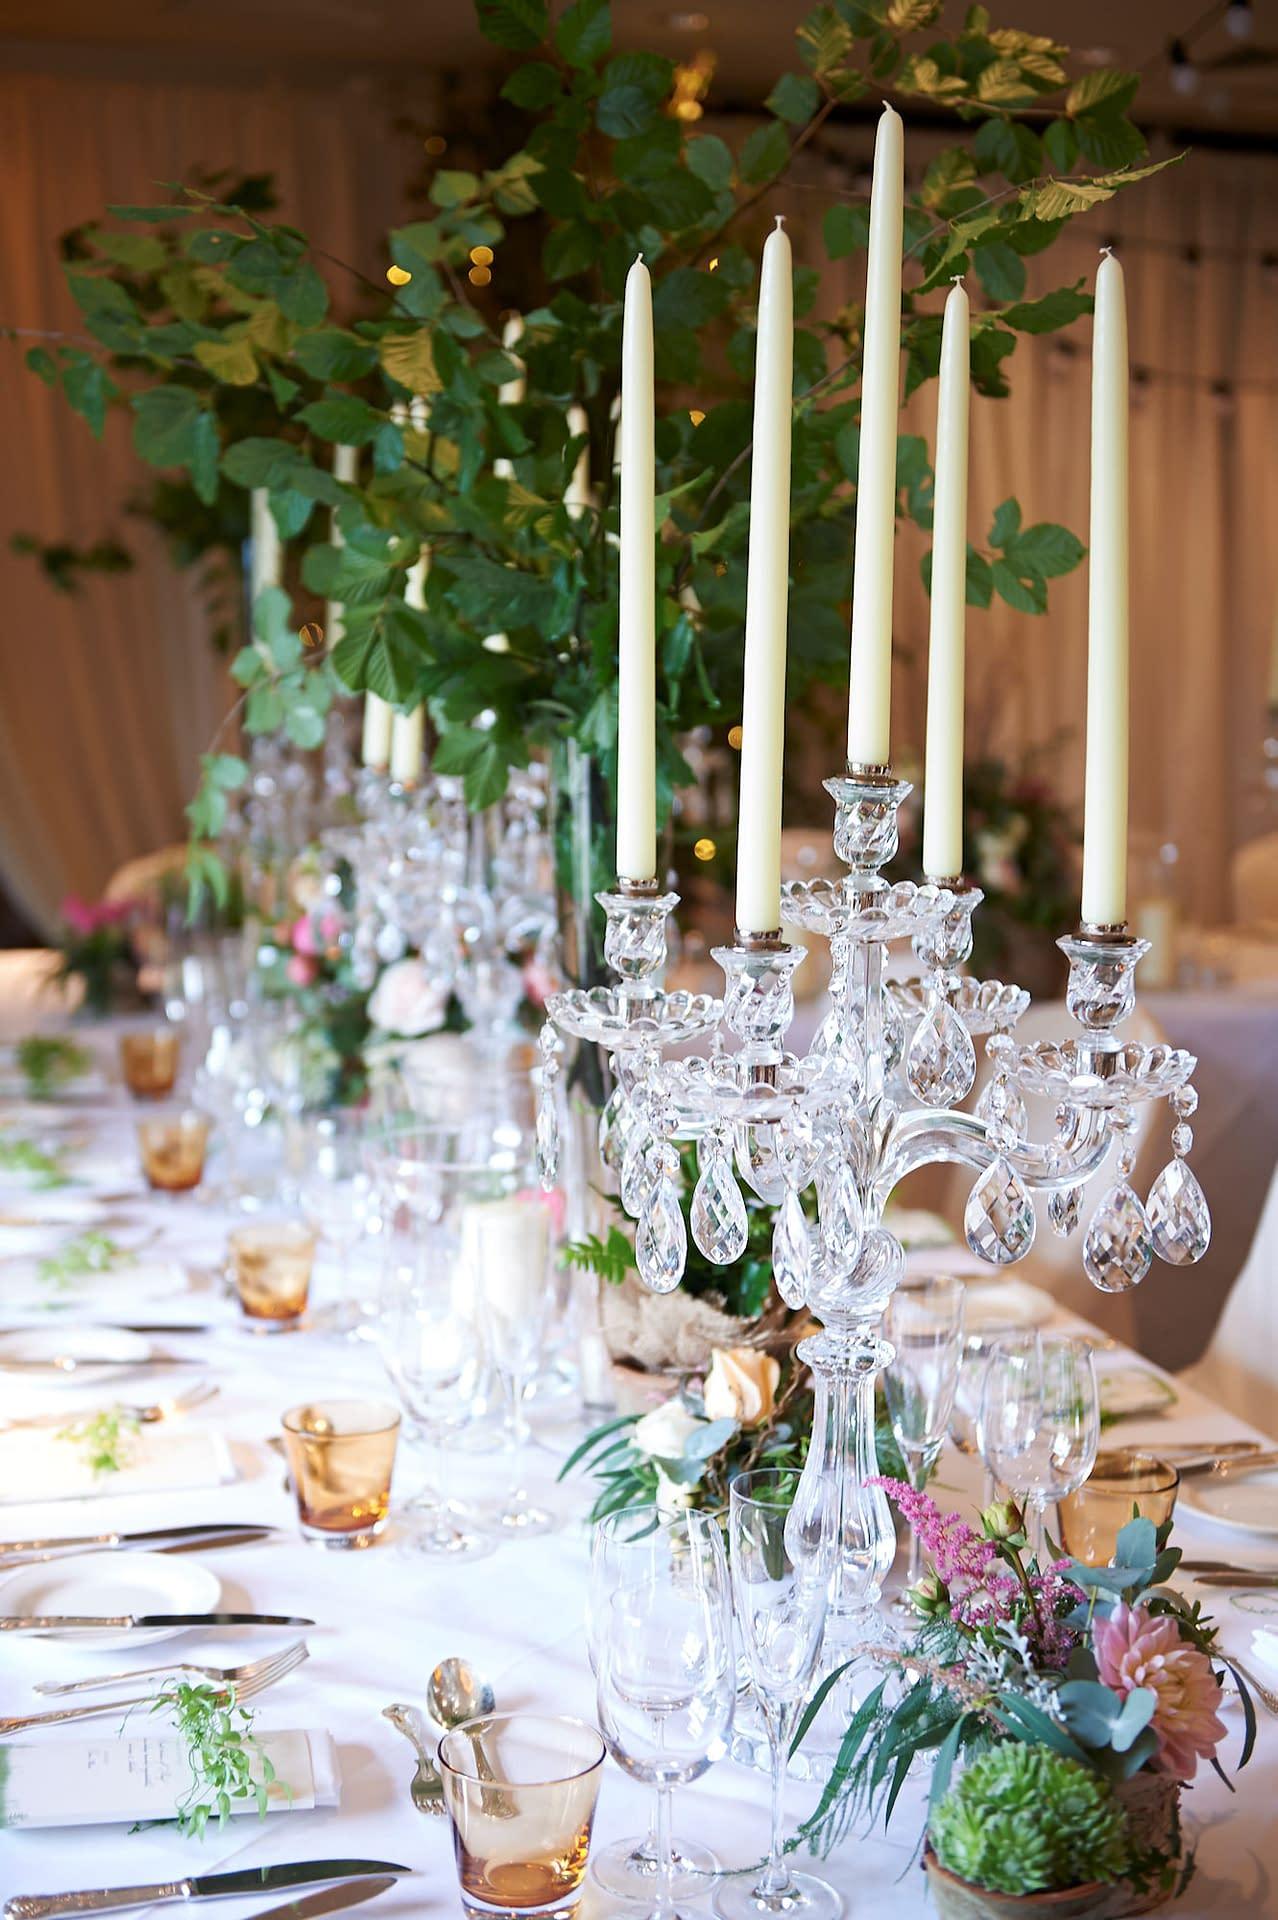 Ivory wall draping, overhead festoon lighting, birch trees with fairy lights at Chewton Glen, Hampshire wedding venue